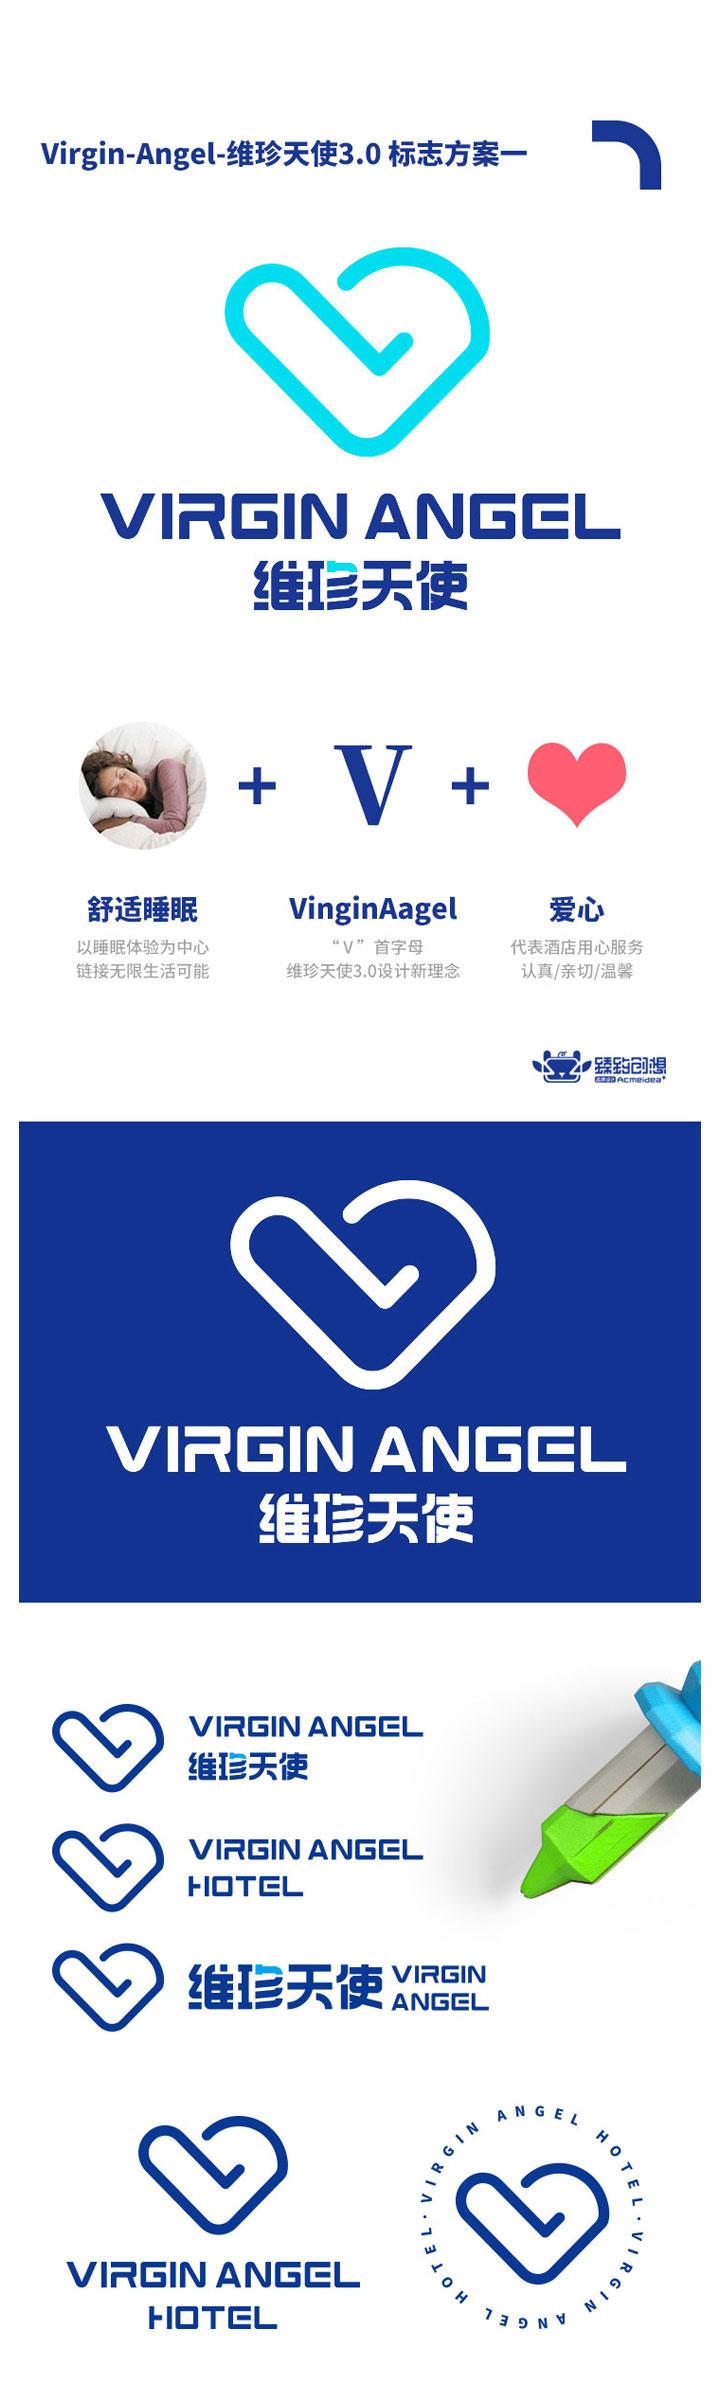 Virgin-Angel-维珍天使酒店品牌设计